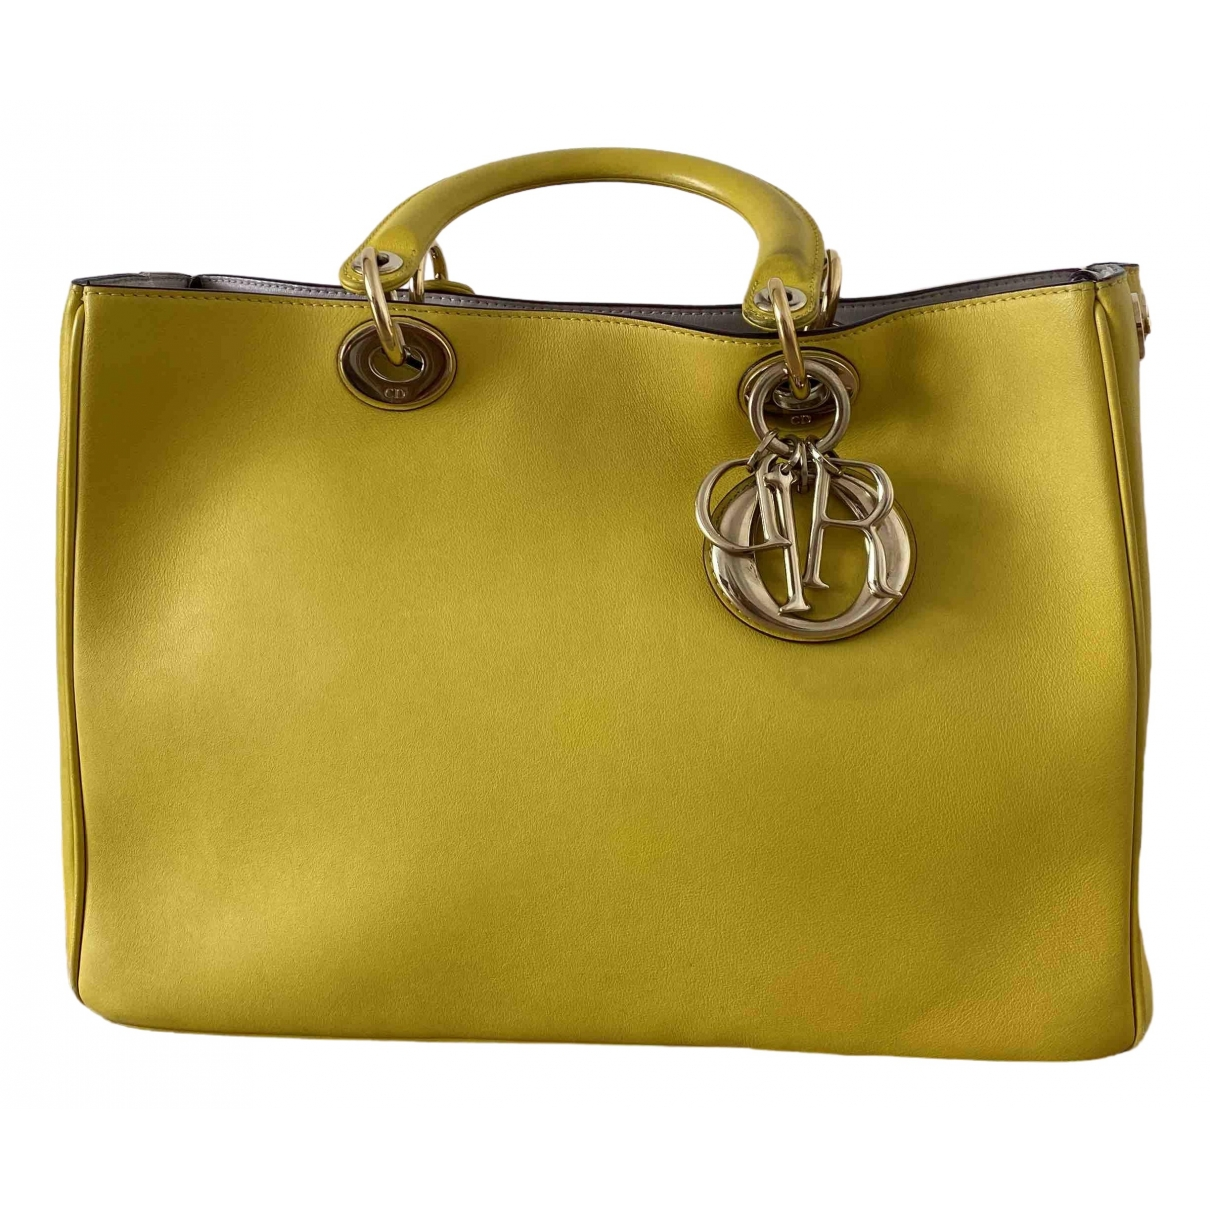 Dior - Sac a main Diorissimo pour femme en cuir - jaune